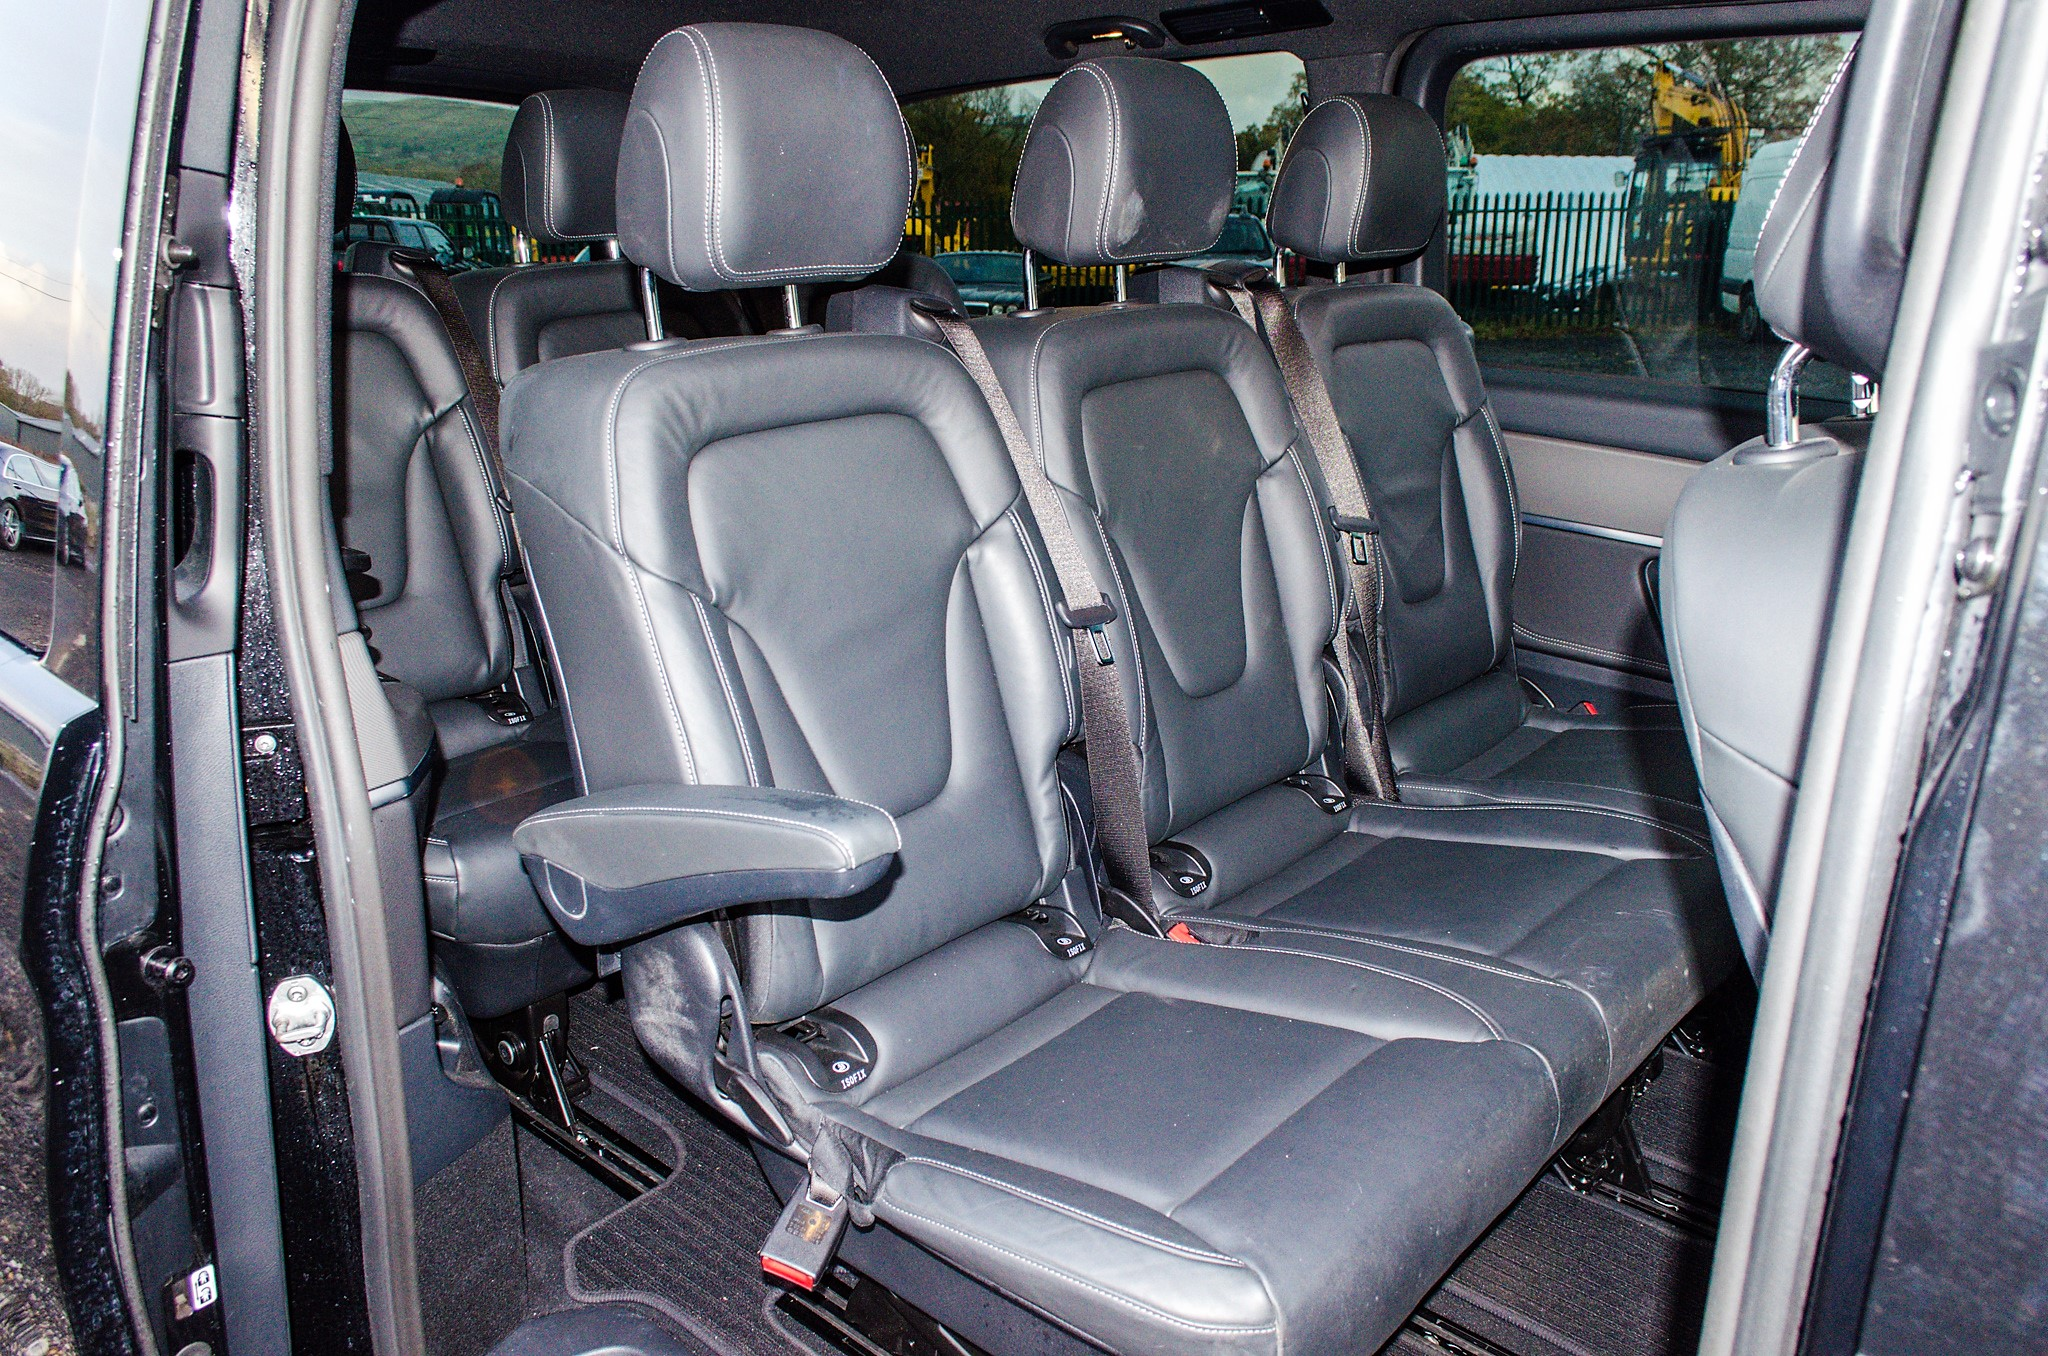 Mercedes Benz V250 Sport Bluetec XLWB auto diesel 8 seat MPV Reg No: FY68 JTO Date of First - Image 19 of 27